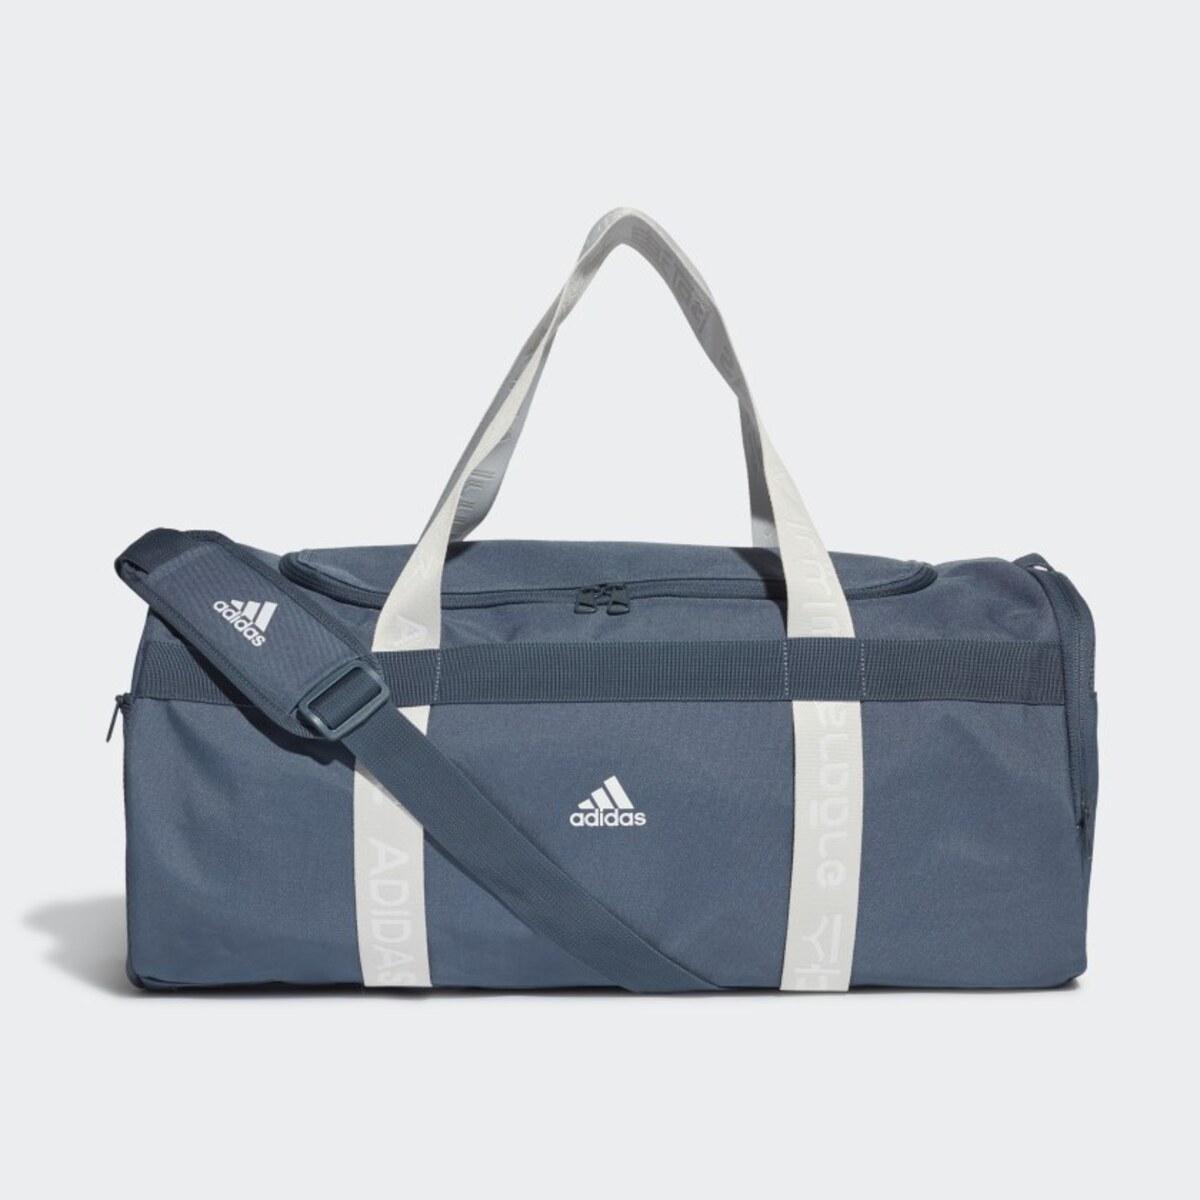 4ATHLTS Mavi Unisex Spor Çantası